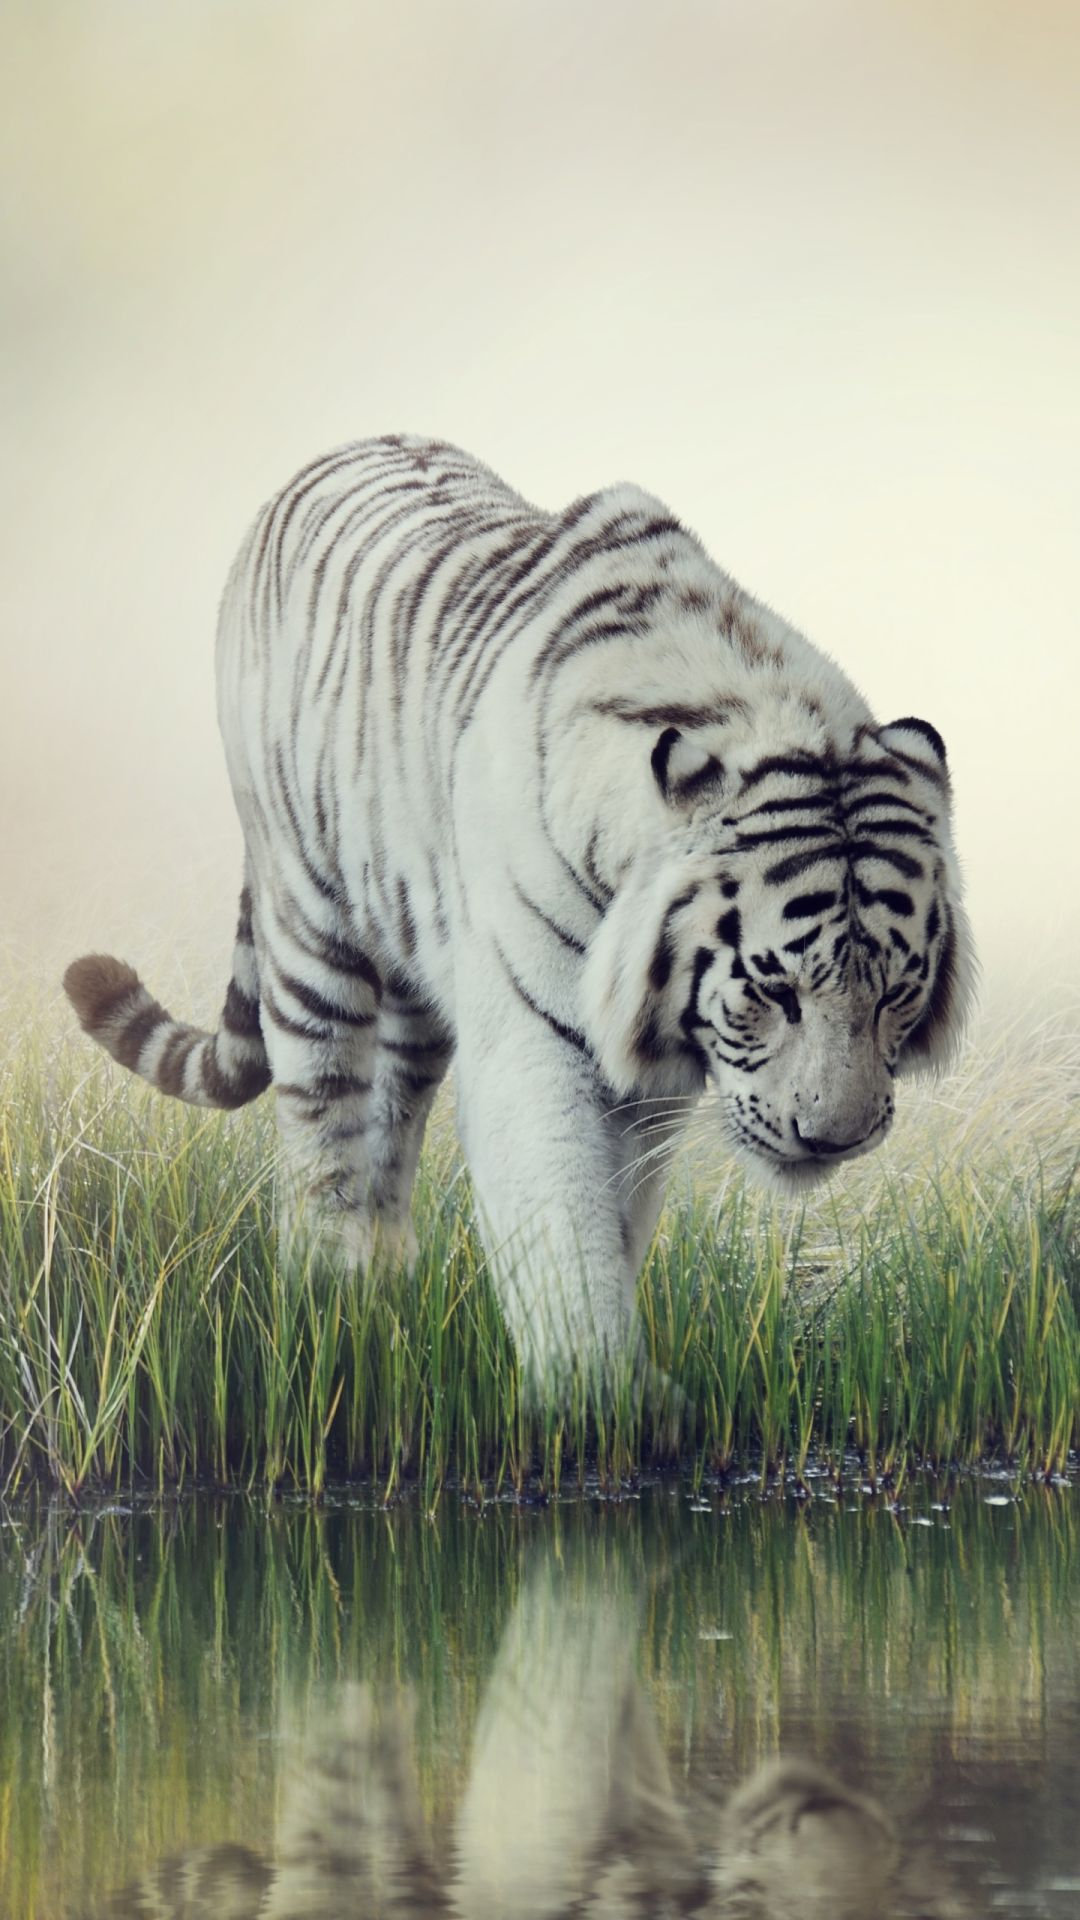 Cool Animal iOS 10 wallpaper